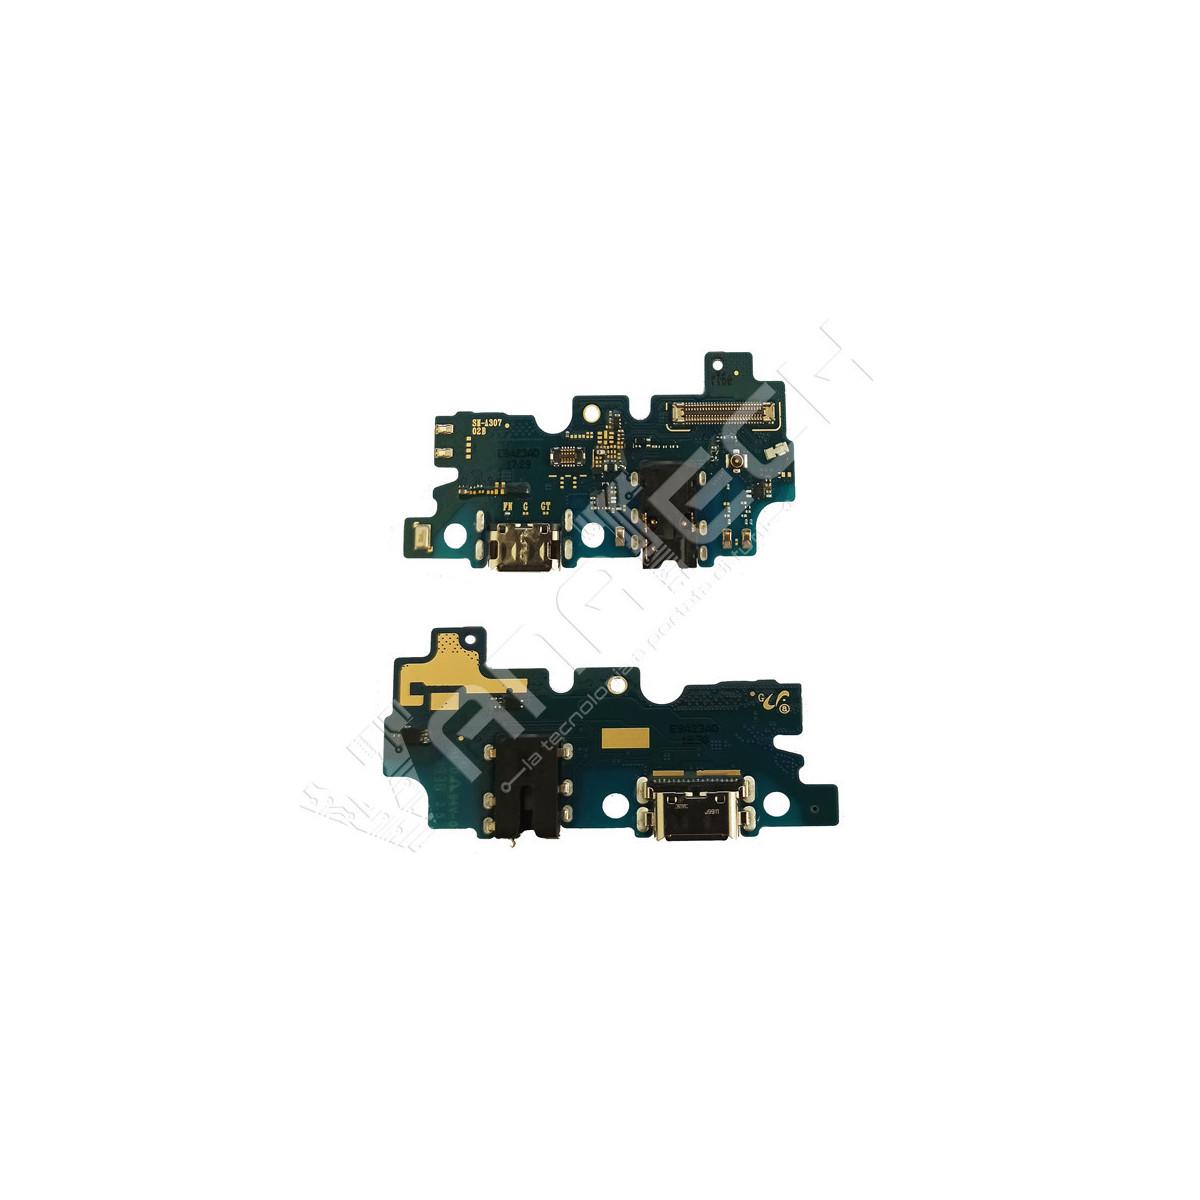 PC DESKTOP COMPLETO CPU INTEL G3900 4GB RAM DDR4 2400MHz 500GB HARD DISK